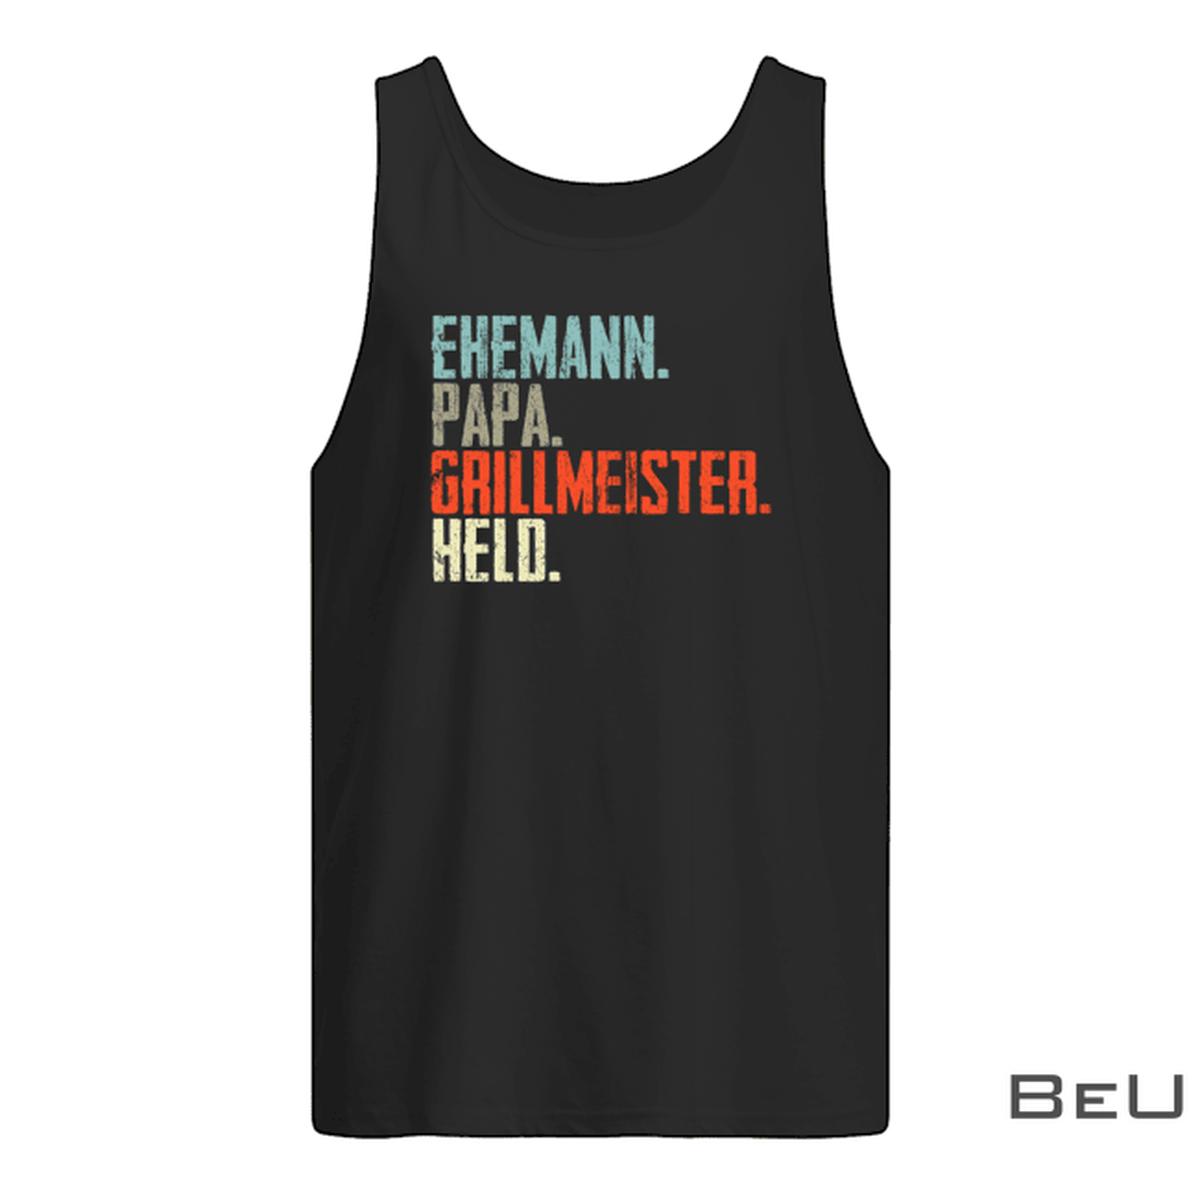 Ehemann Papa Grillmeister Held Shirtz